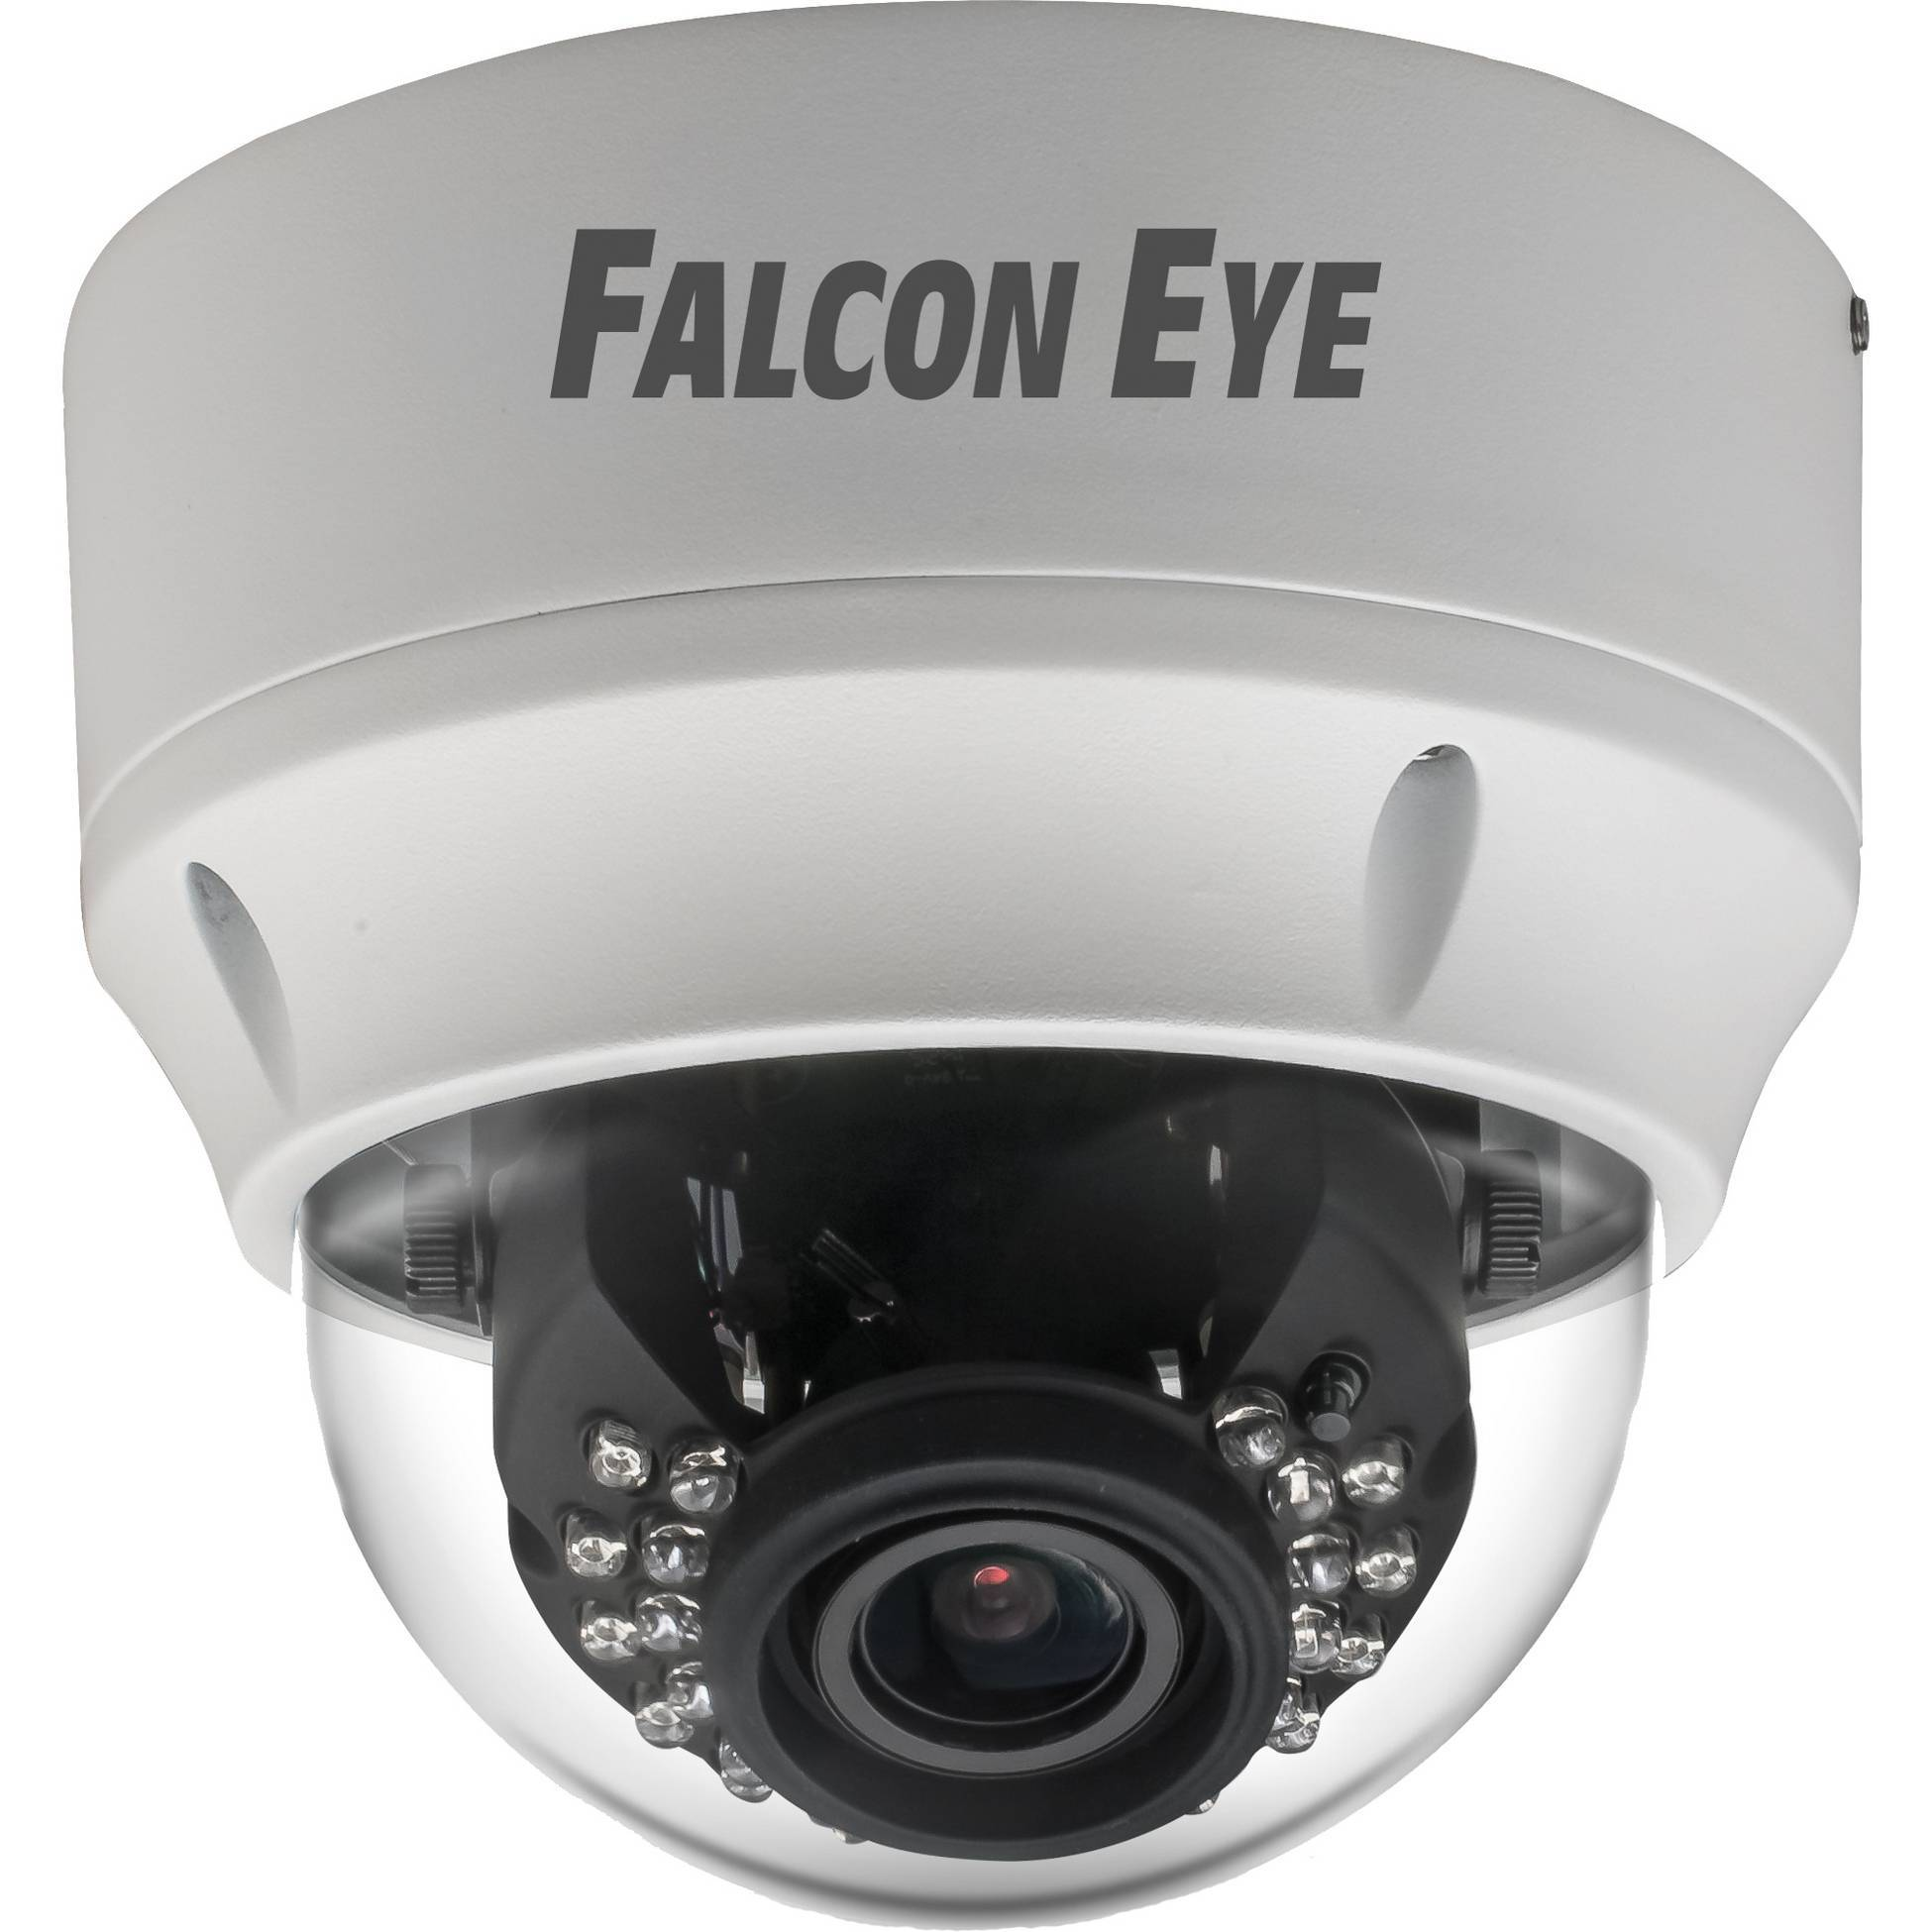 IP-камера купольная FALCON EYE FE-IPC-DL201PVA